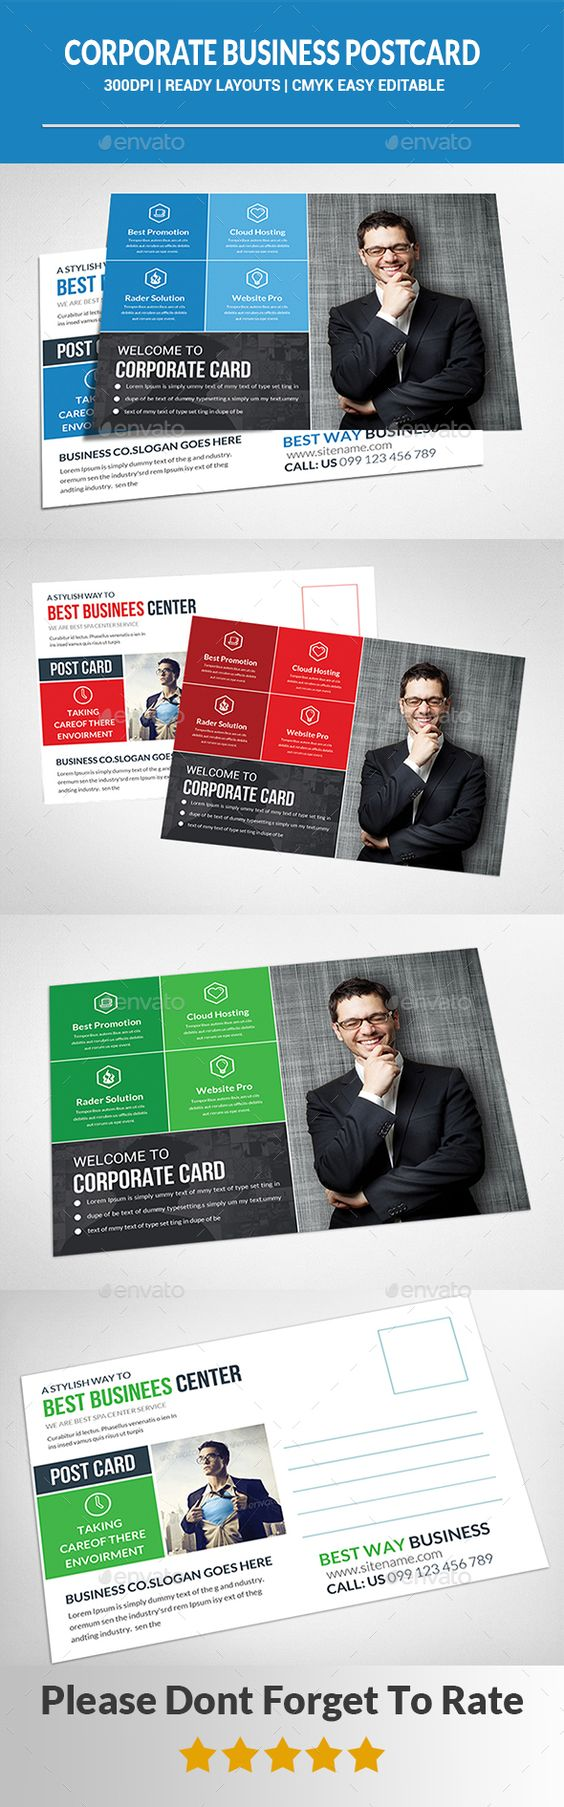 Business postcard design ideas google search postcard design business postcard design ideas google search postcard design pinterest business postcards and postcard design baanklon Gallery